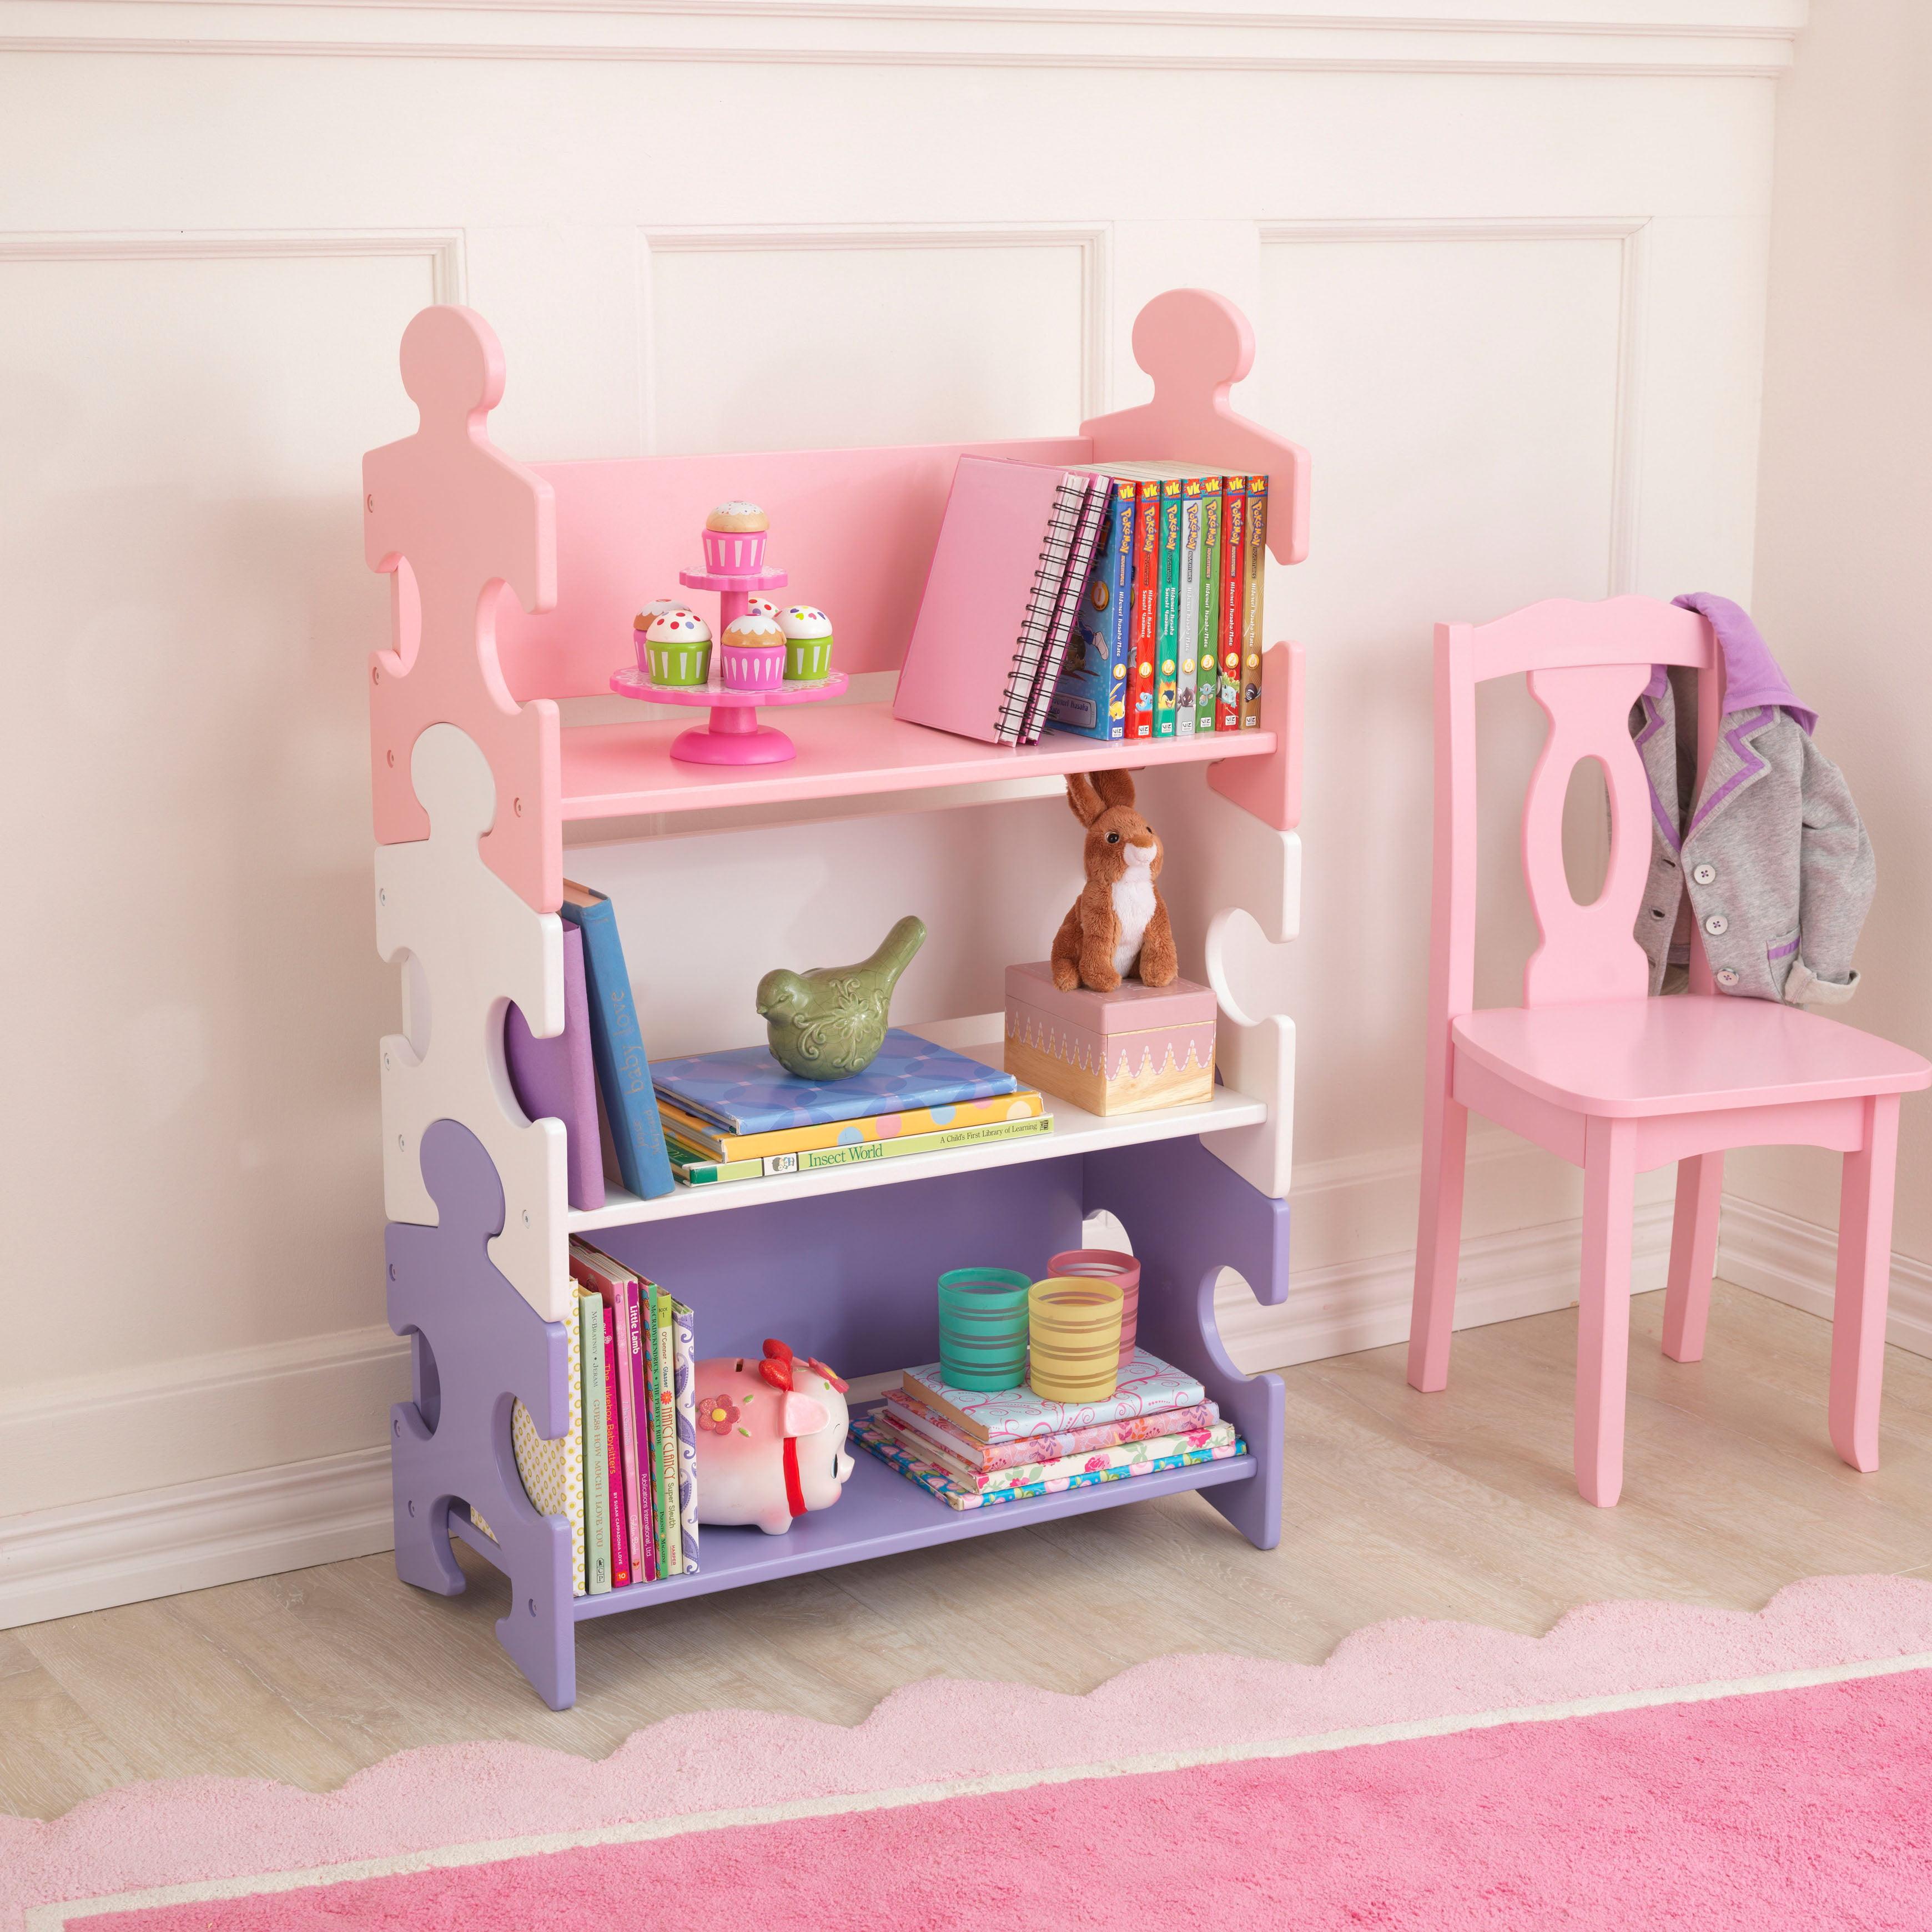 KidKraft Puzzle Bookshelf, Red/Blue/Green or Purple/White/Pink